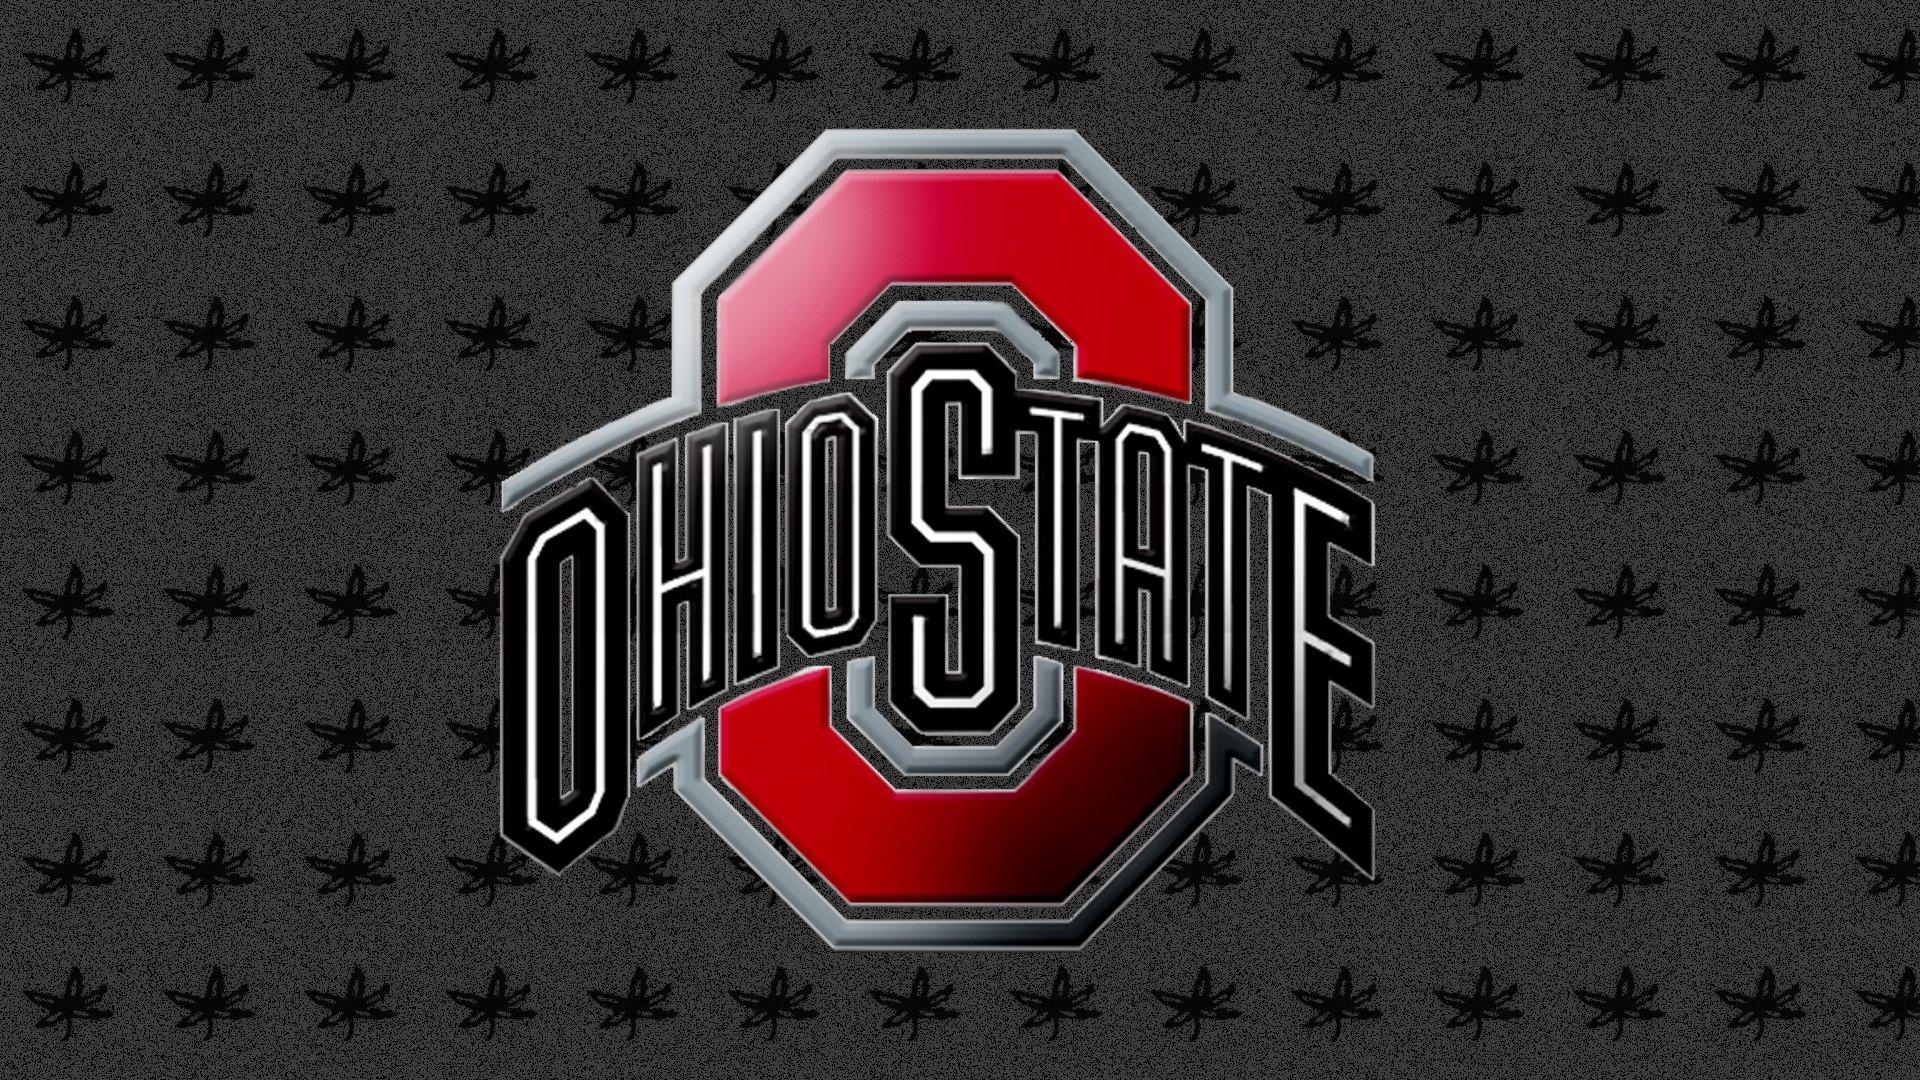 Ohio State Football images OSU Desktop Wallpaper 55 HD ...